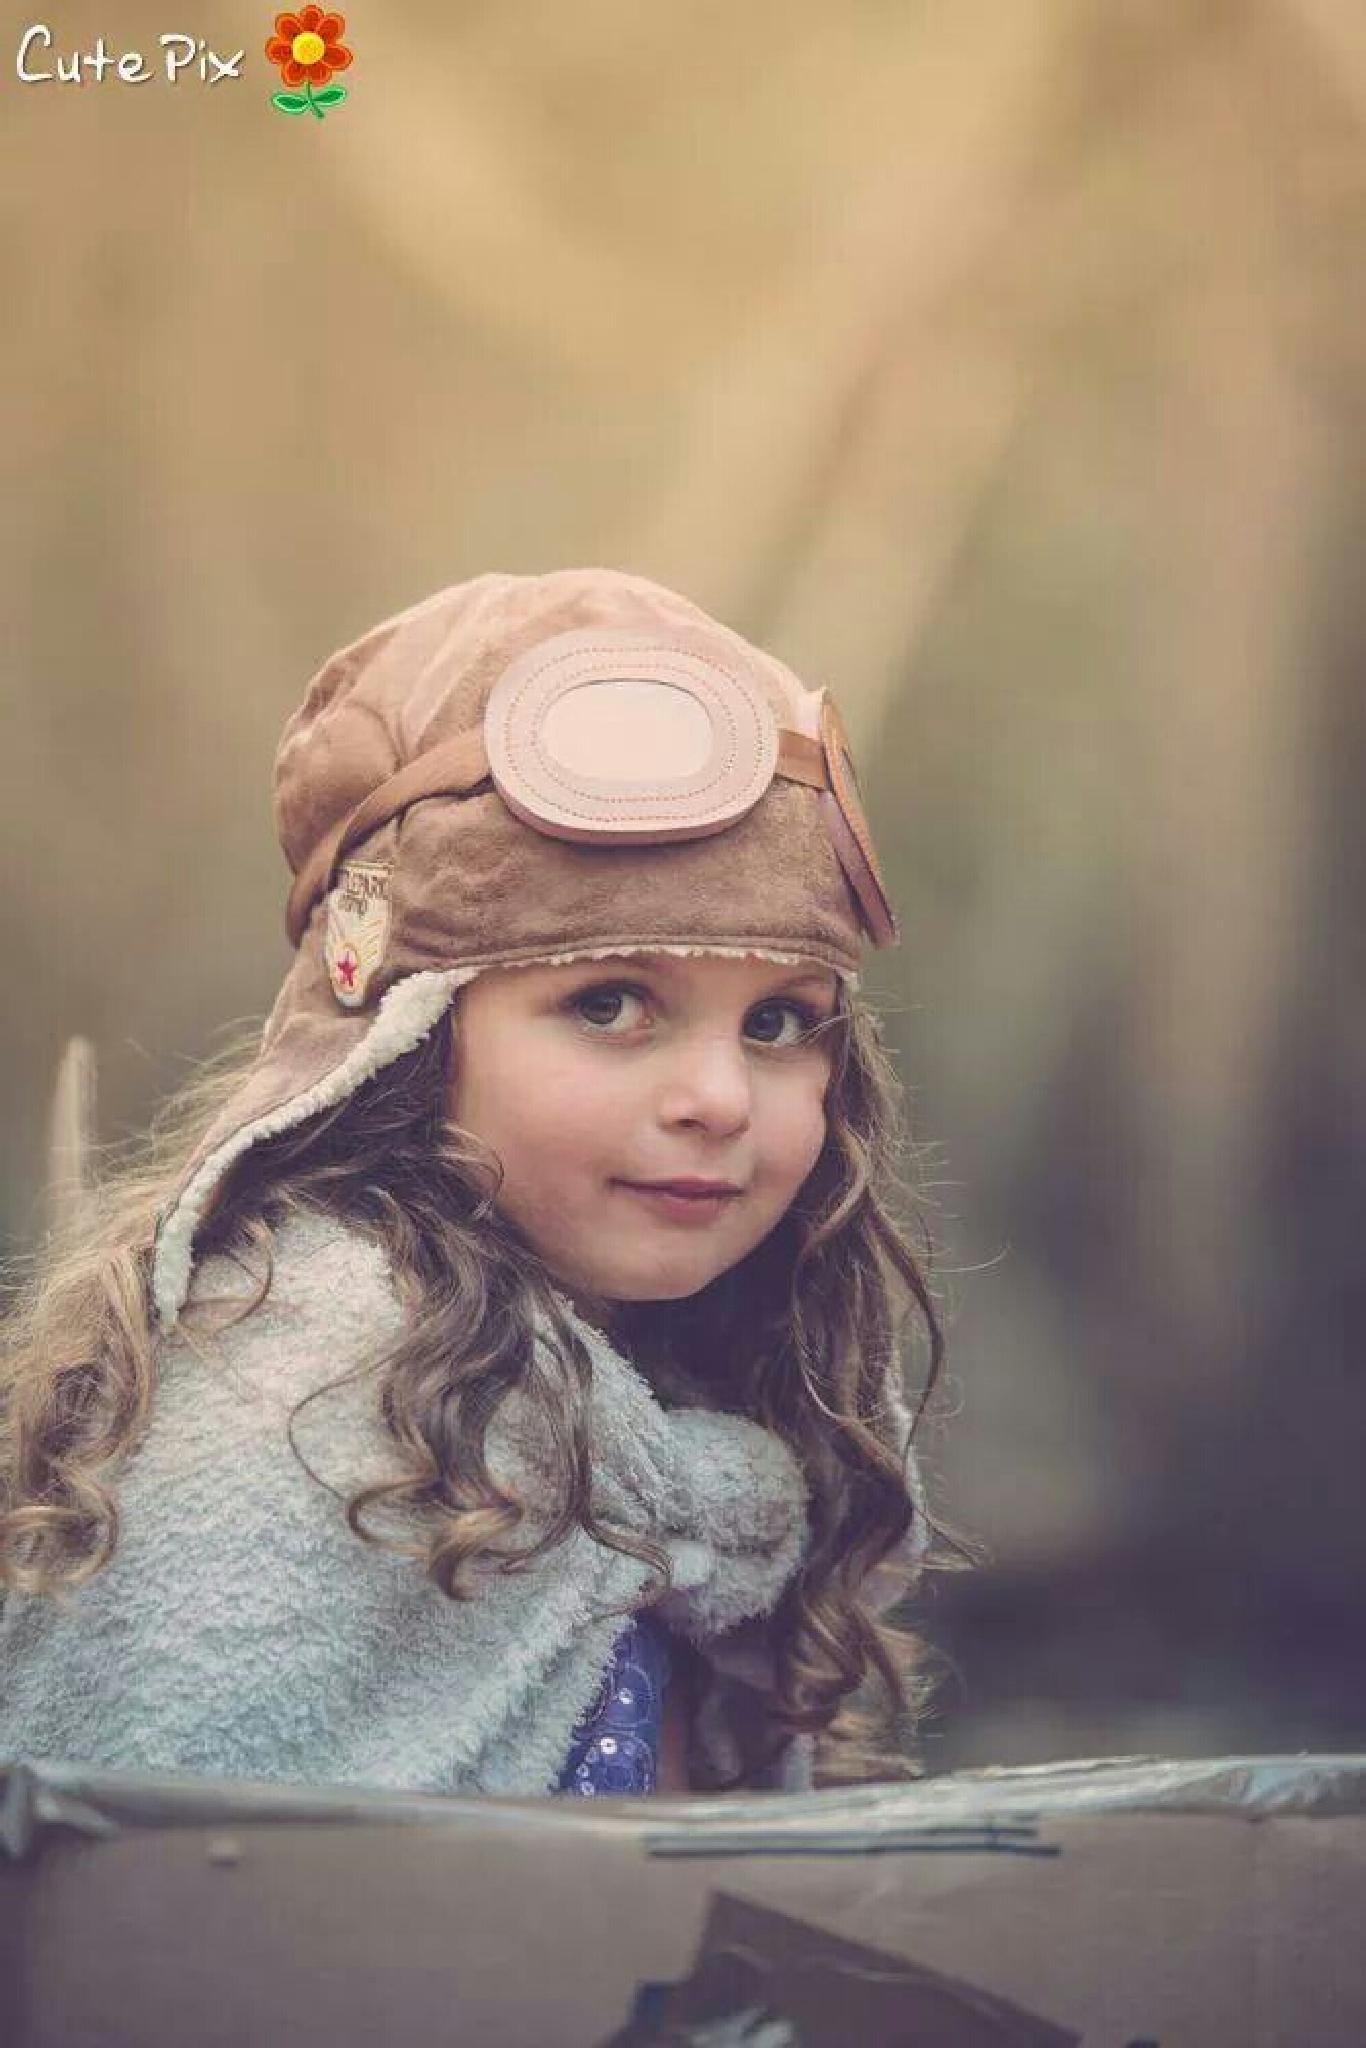 Little Pilot by Michelle Janse van Rensburg